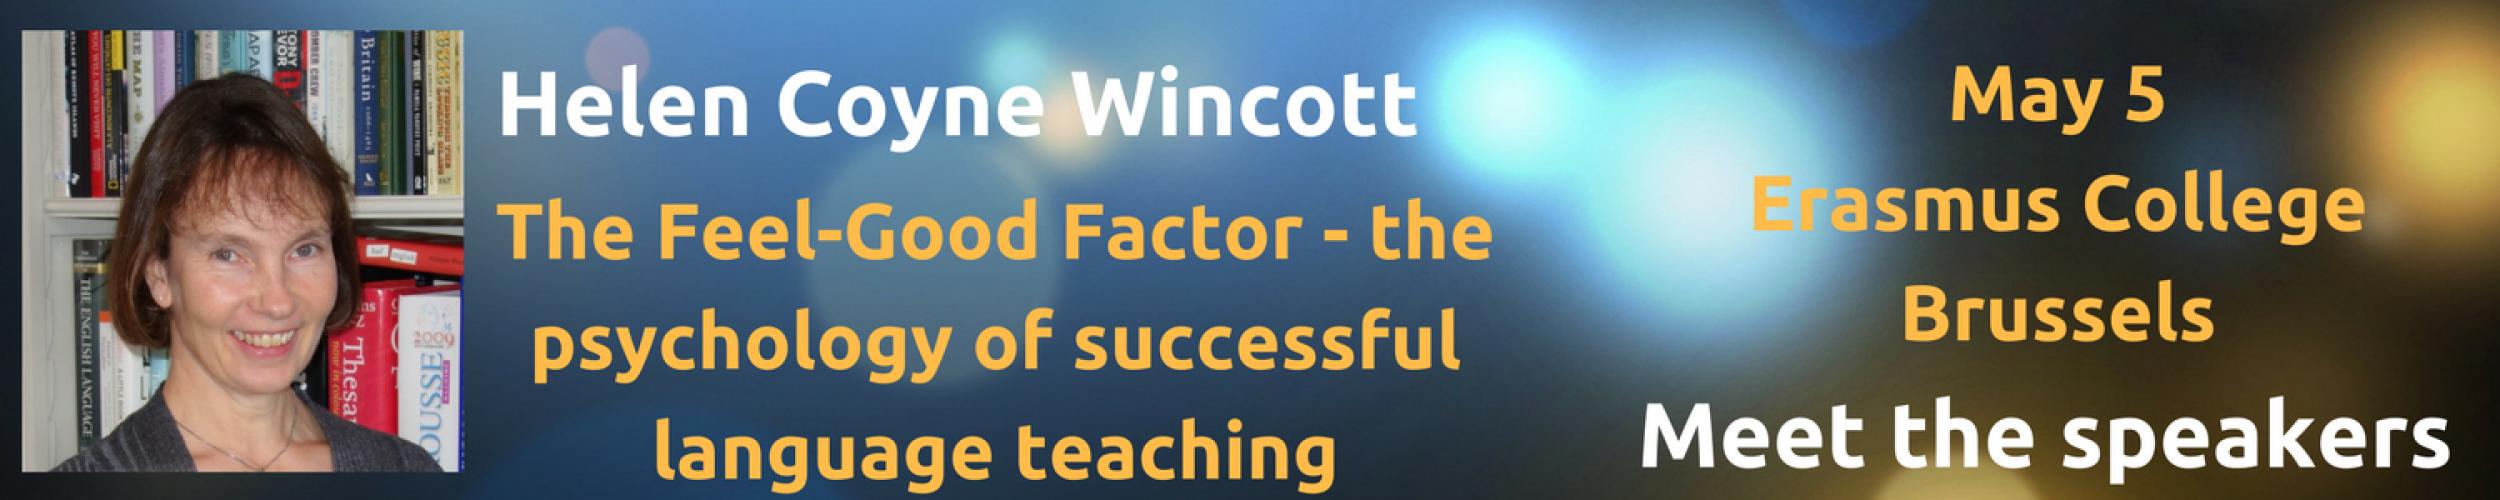 Meet The Speakers: Helen Coyne Wincott